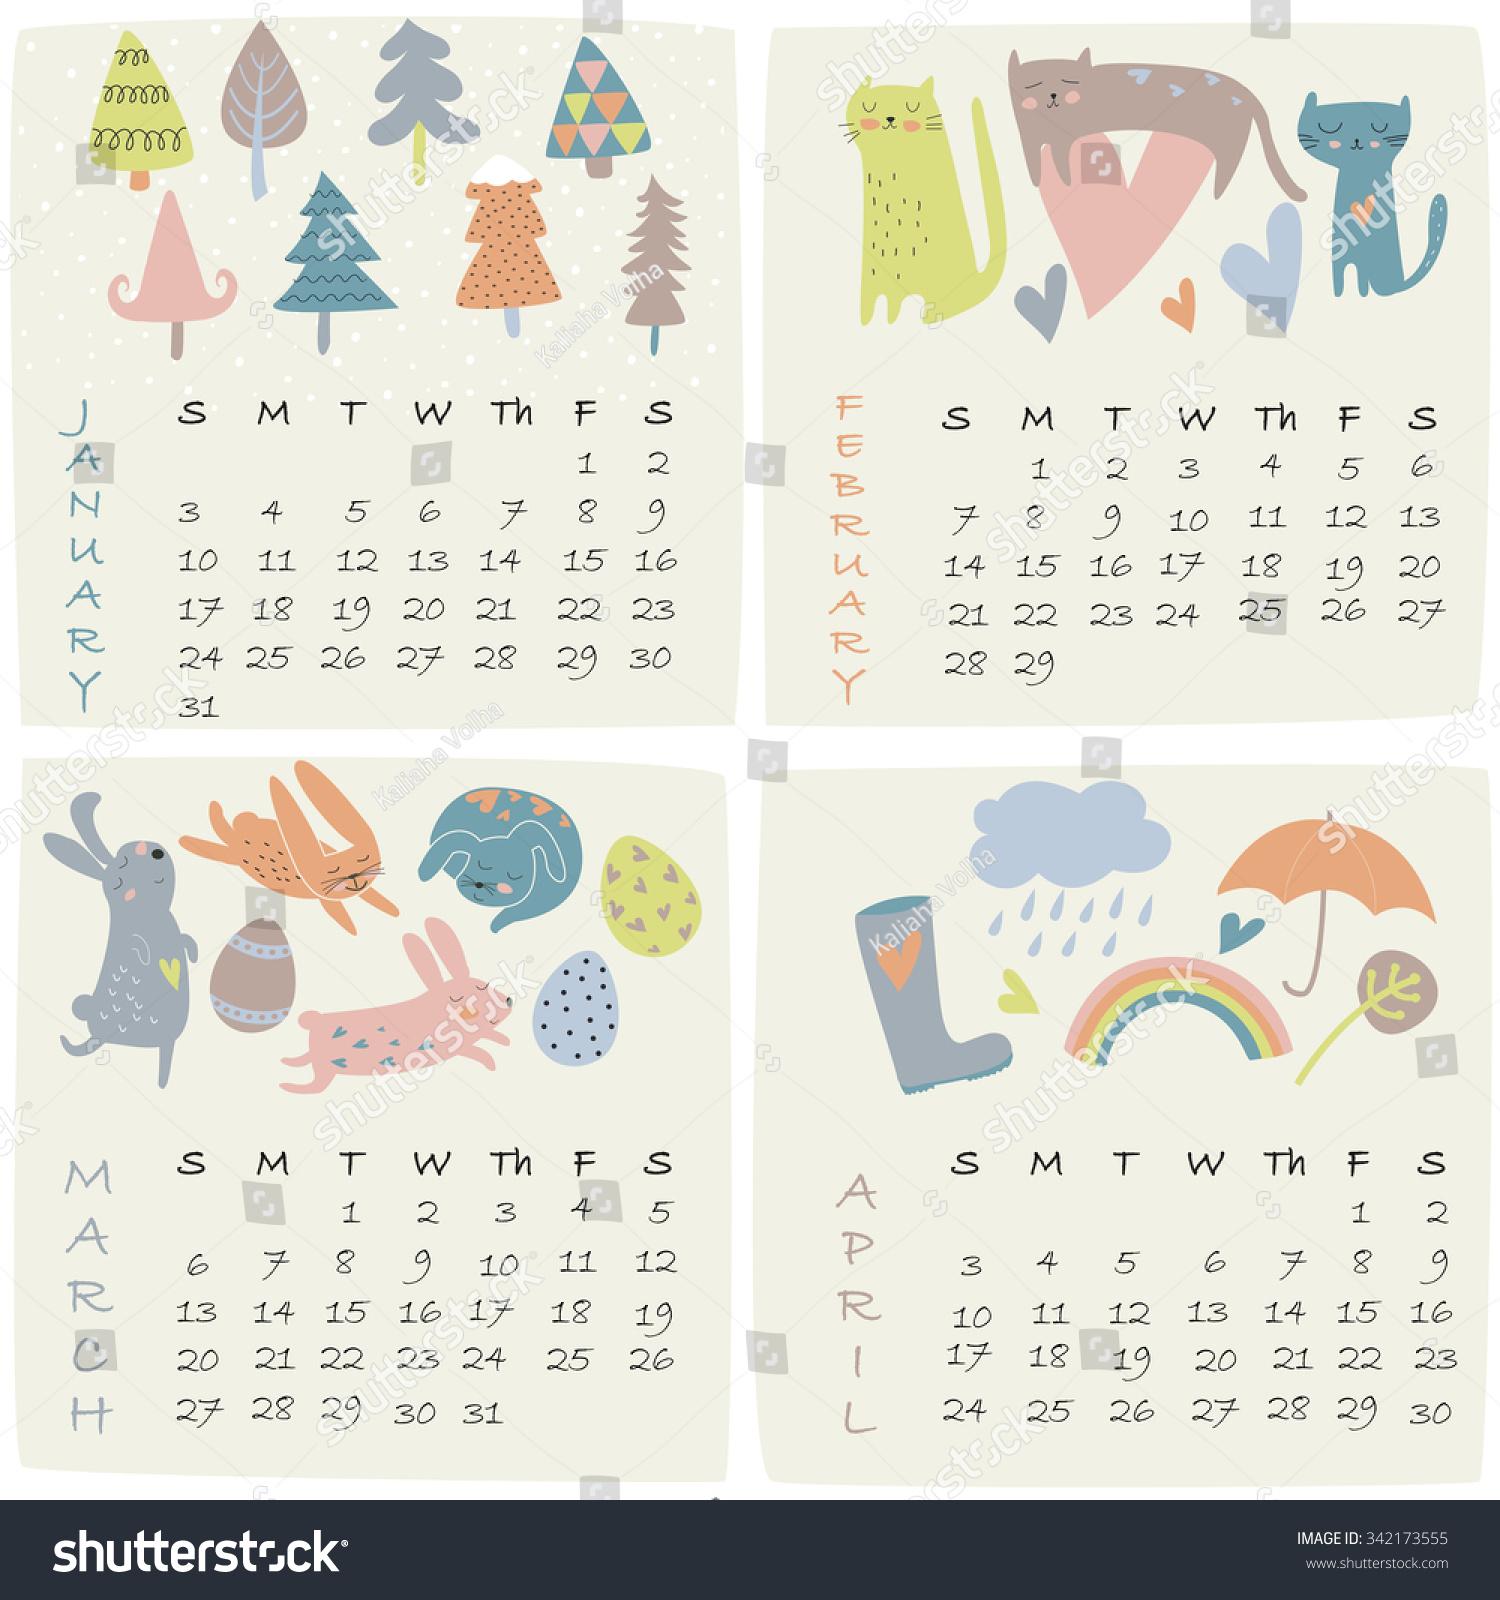 April Calendar Illustration : Calendar january february march april stock vector